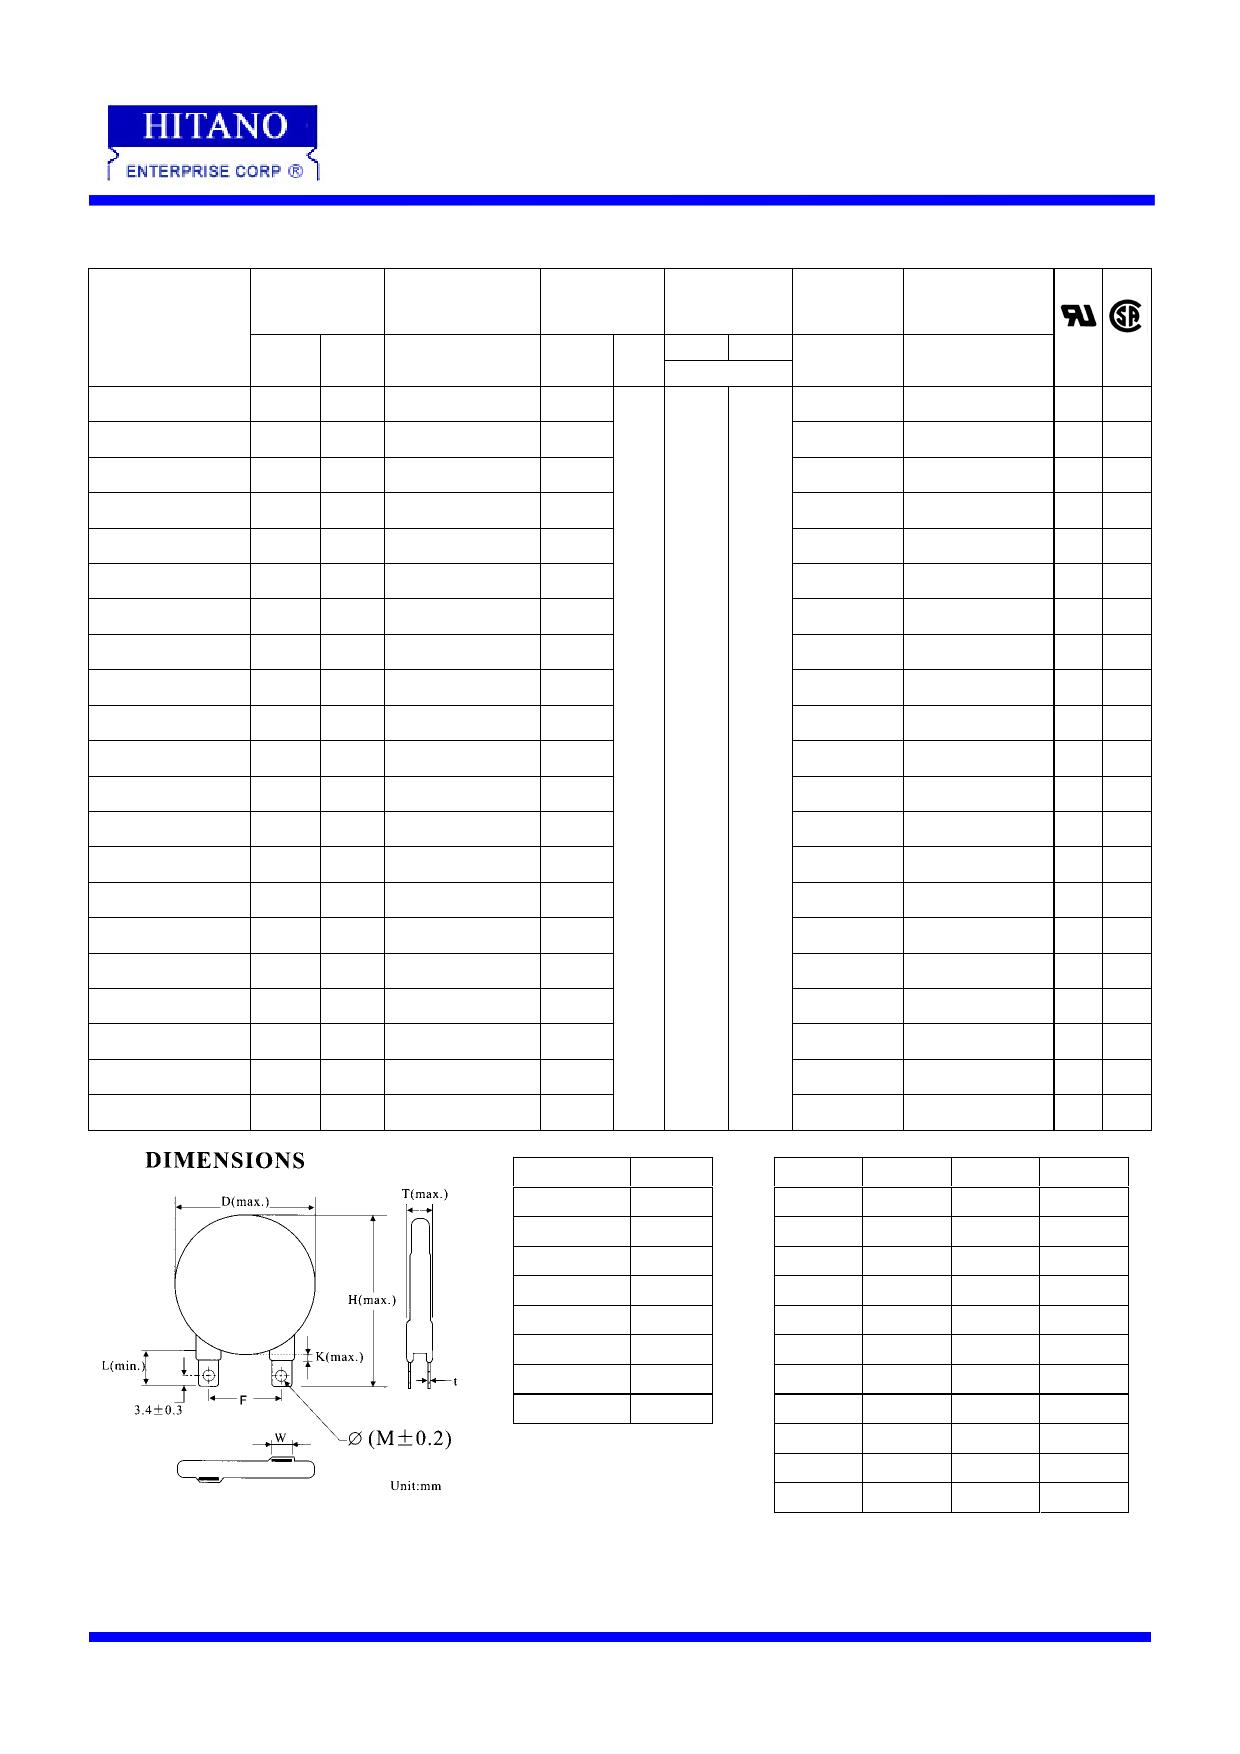 VCR-32D391K datasheet